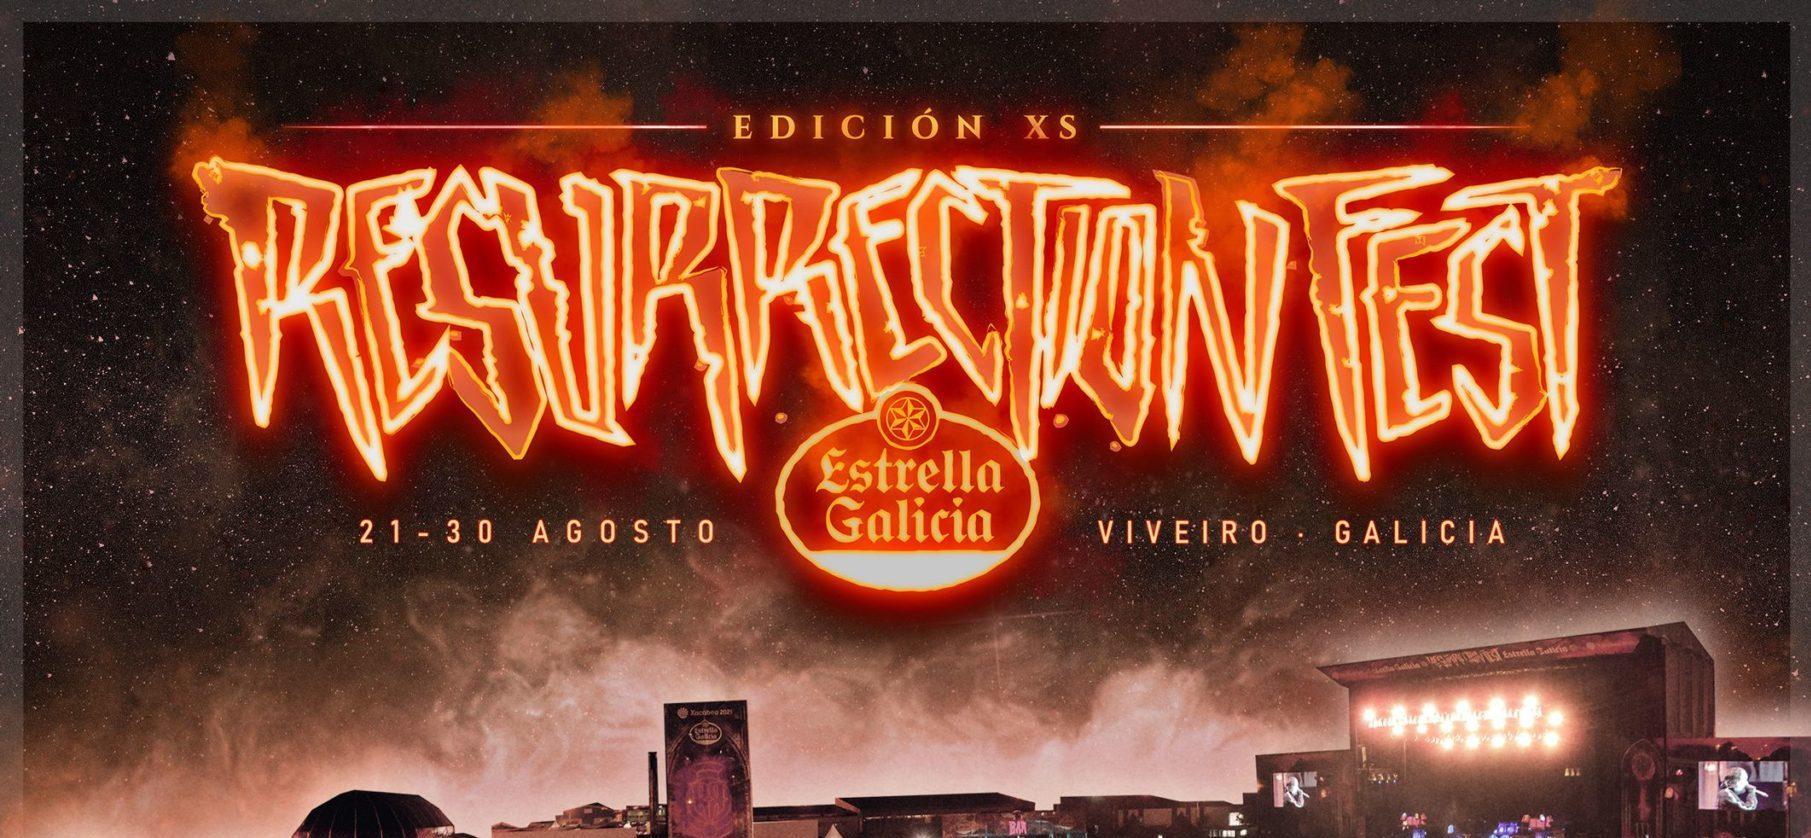 Cartel del Resurrection Fest 2020 / Resurrection Fest